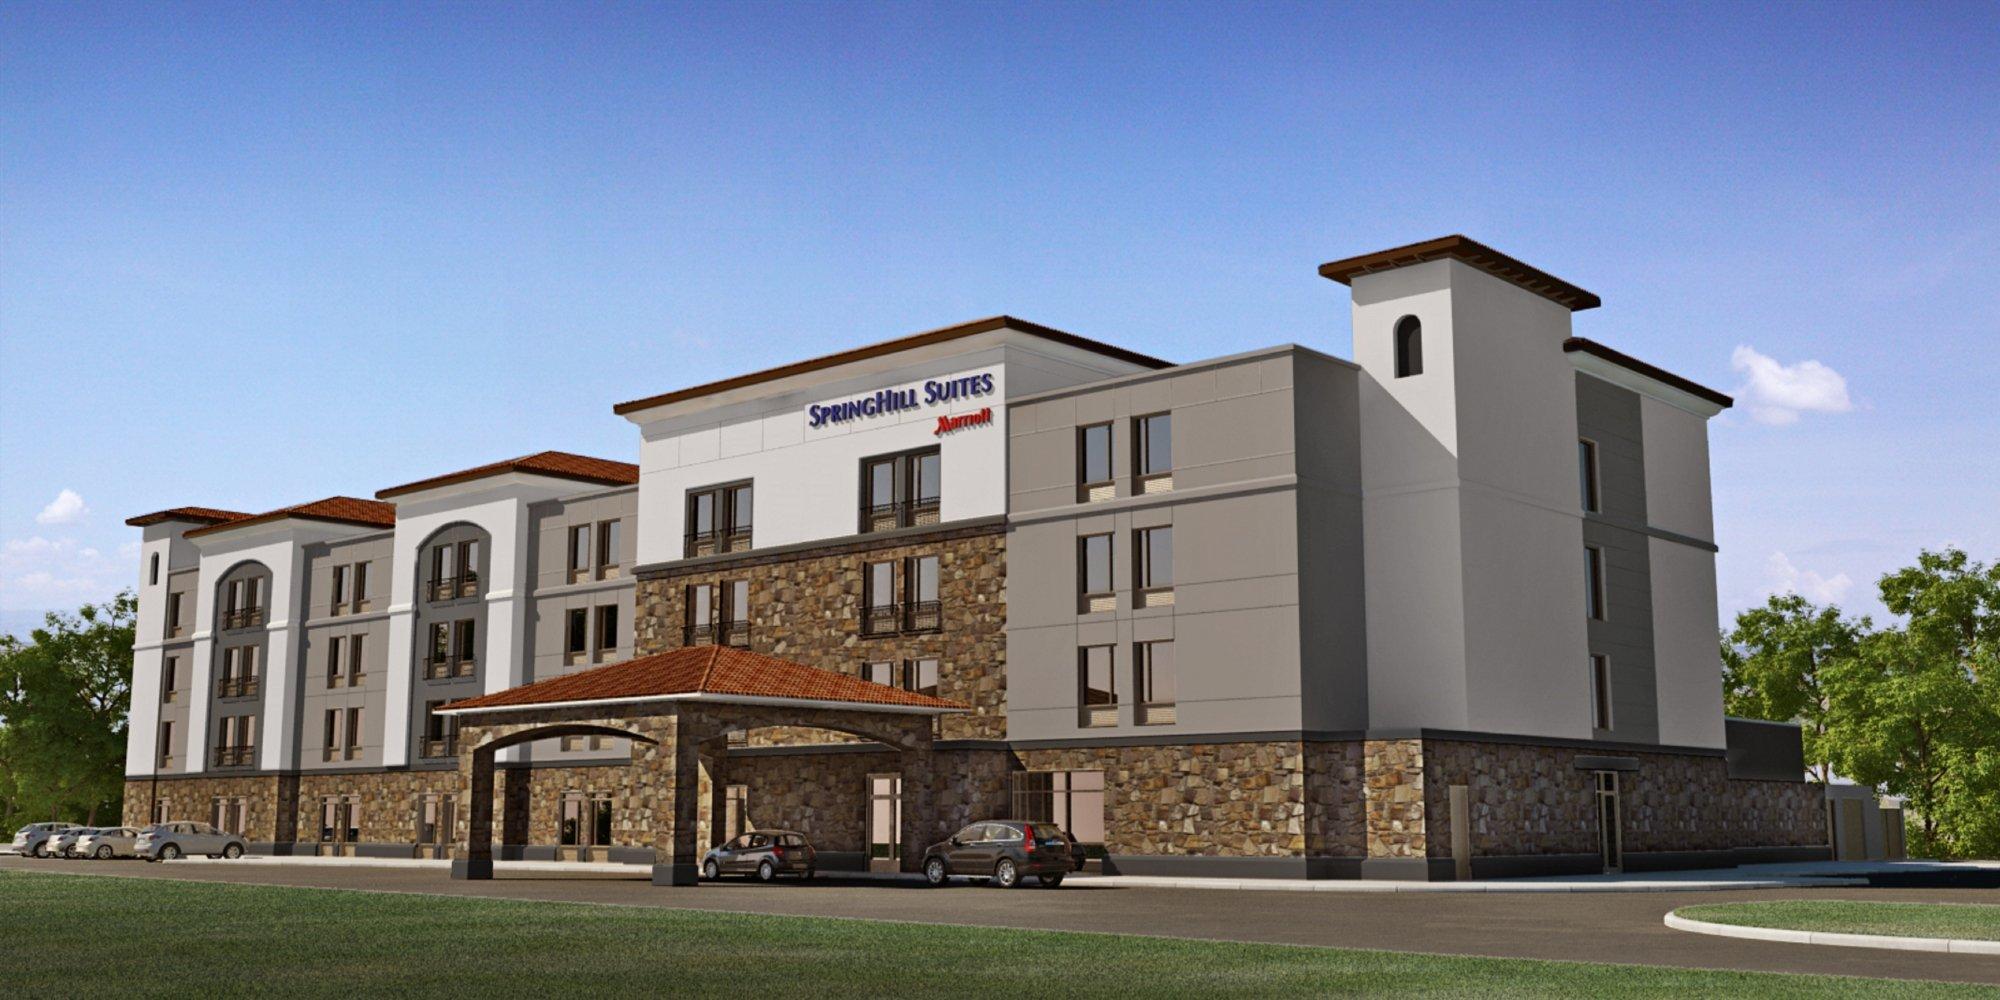 5 star hotels dallas – benbie